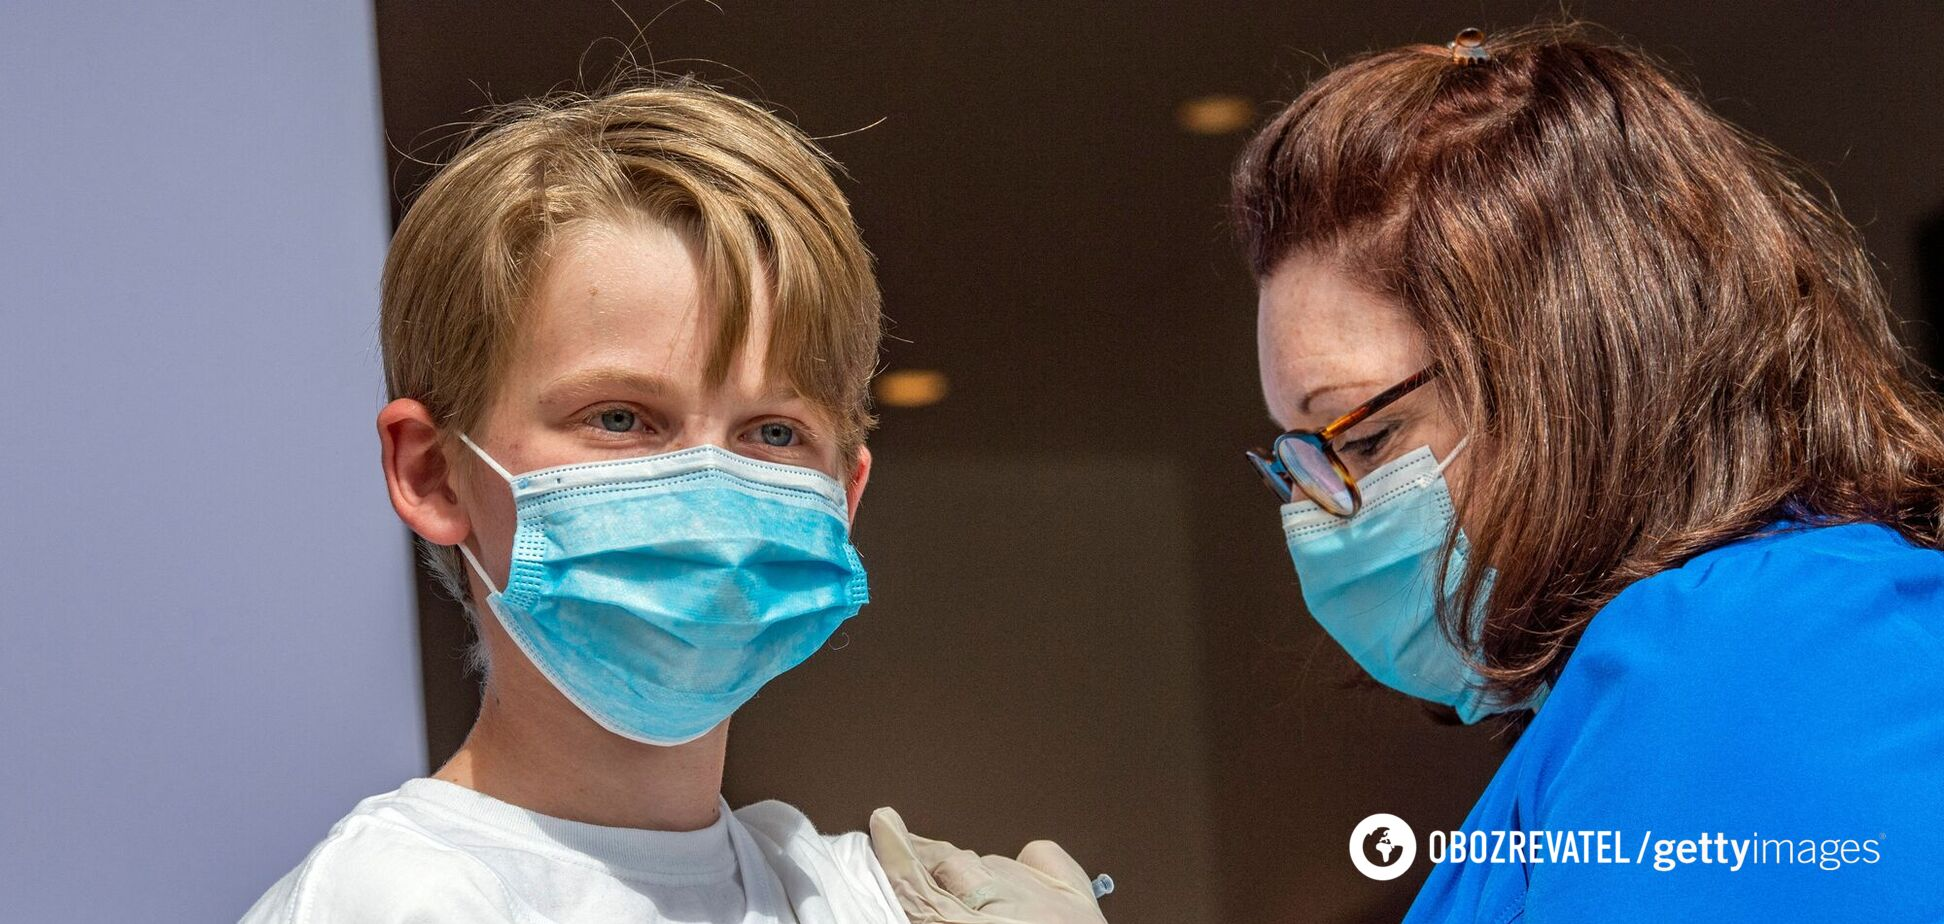 В ООН предупредили о новых пандемиях из-за снижения иммунизации детей